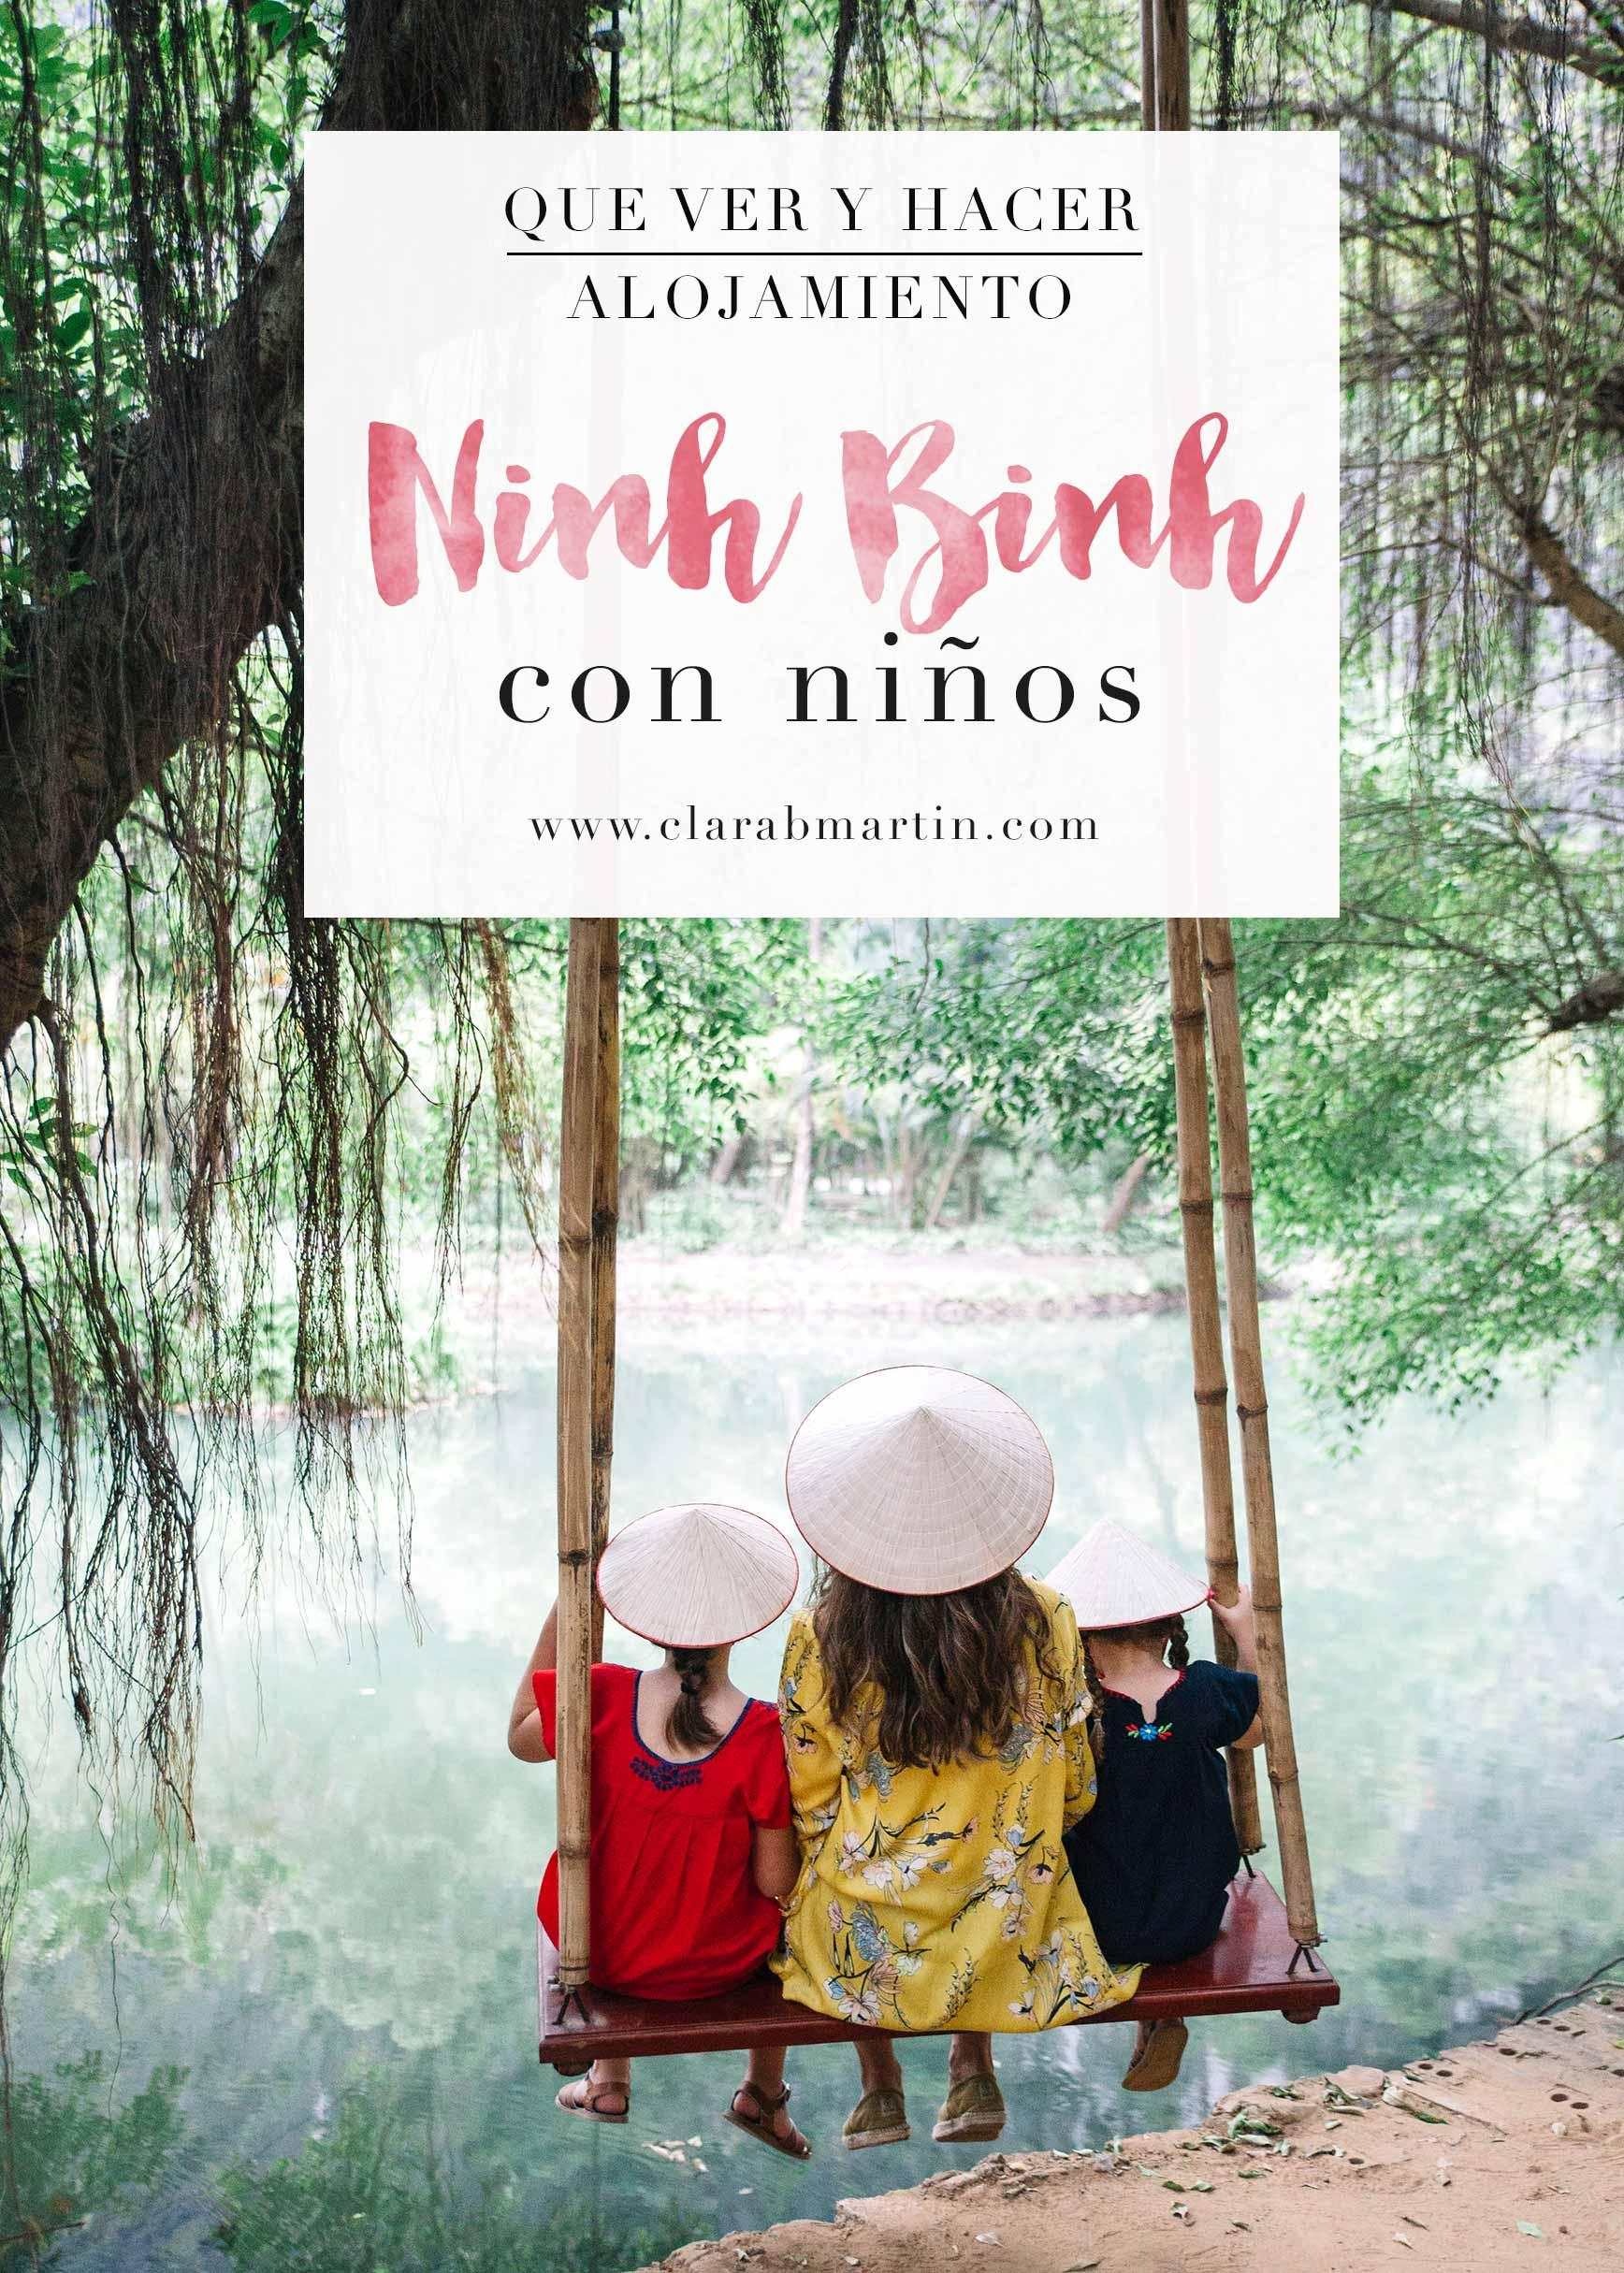 Ninh-Binh_298